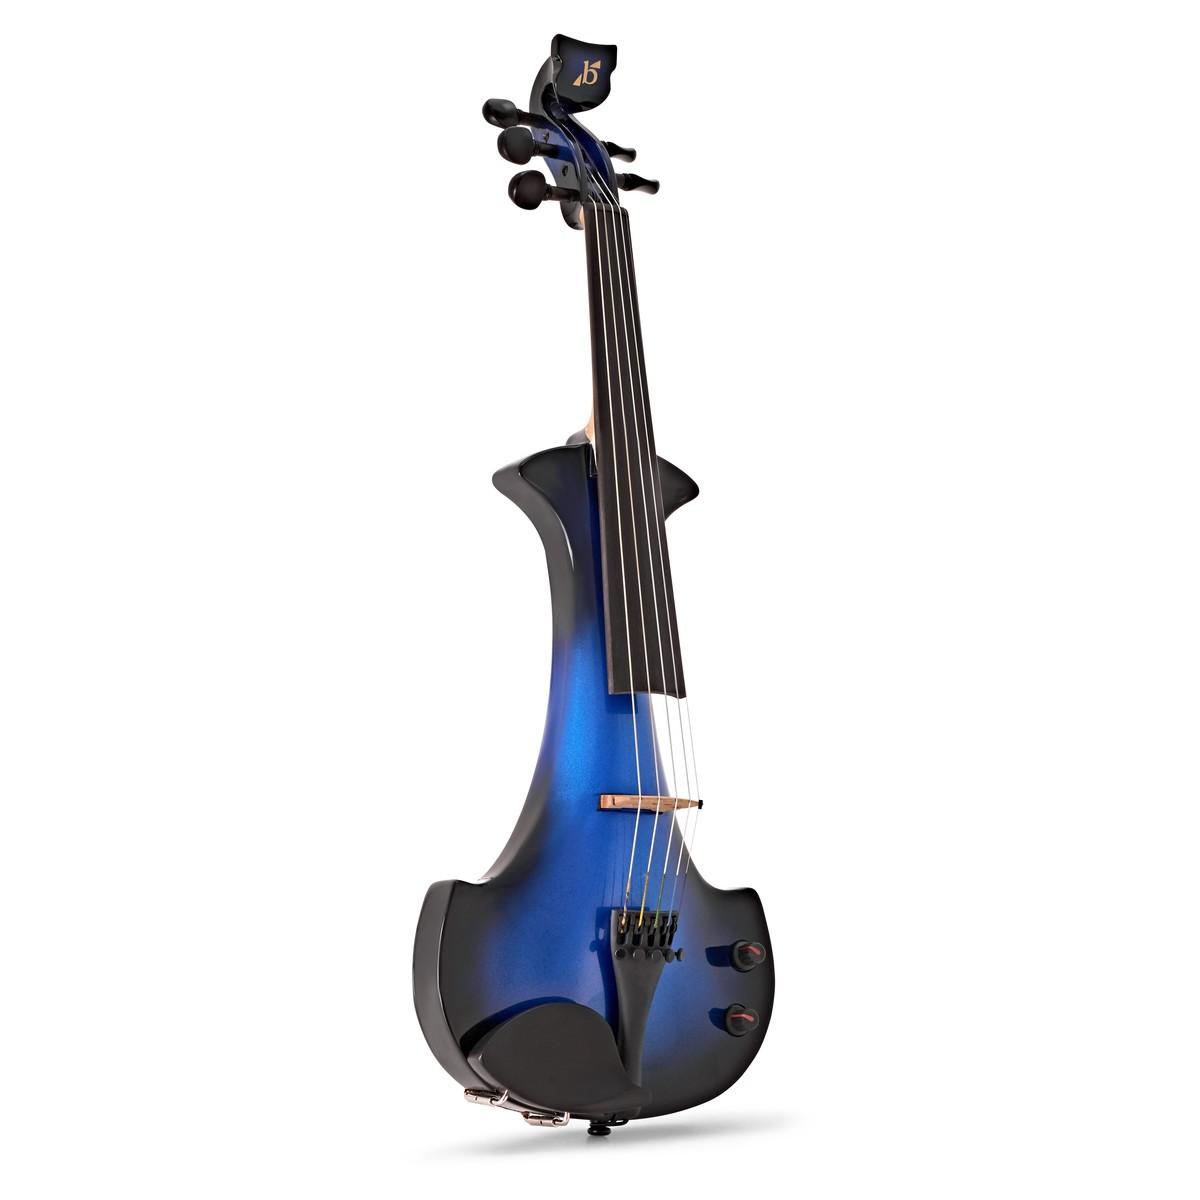 Ebony Fingerboard Violin Parts For Violin Makers Diy Violin Accessories Sports & Entertainment 5 Strings Violin Maple Neck Musical Instruments